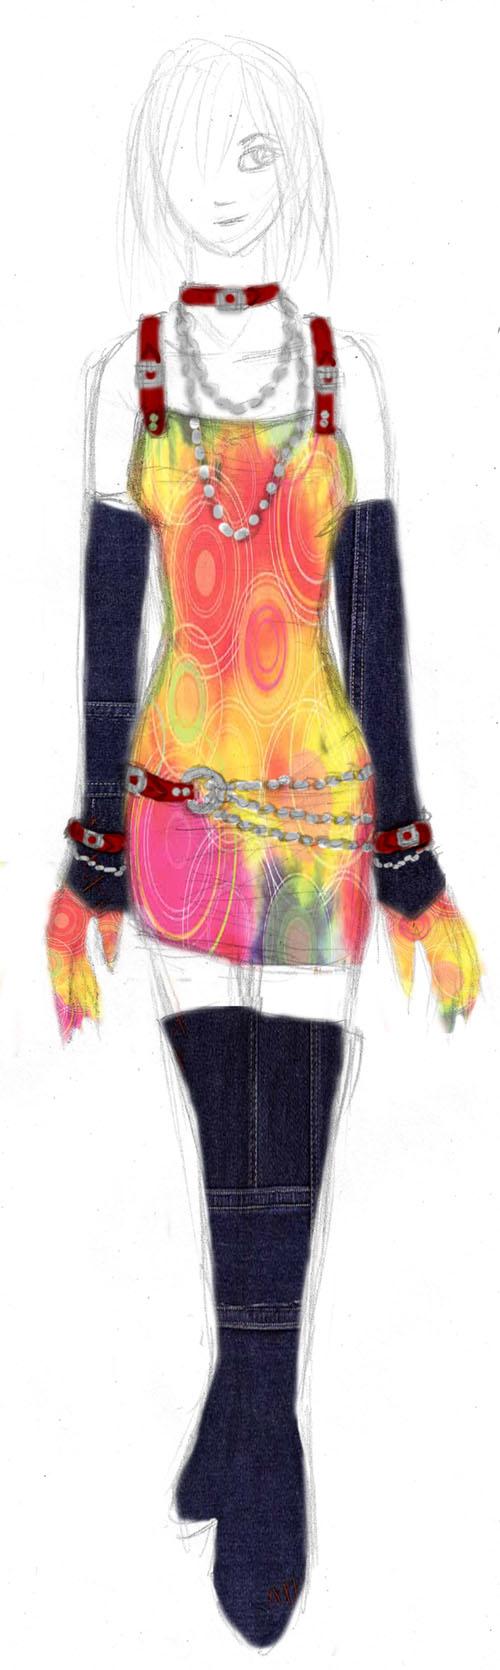 Scrapbook Paper Disco Dress by golddew